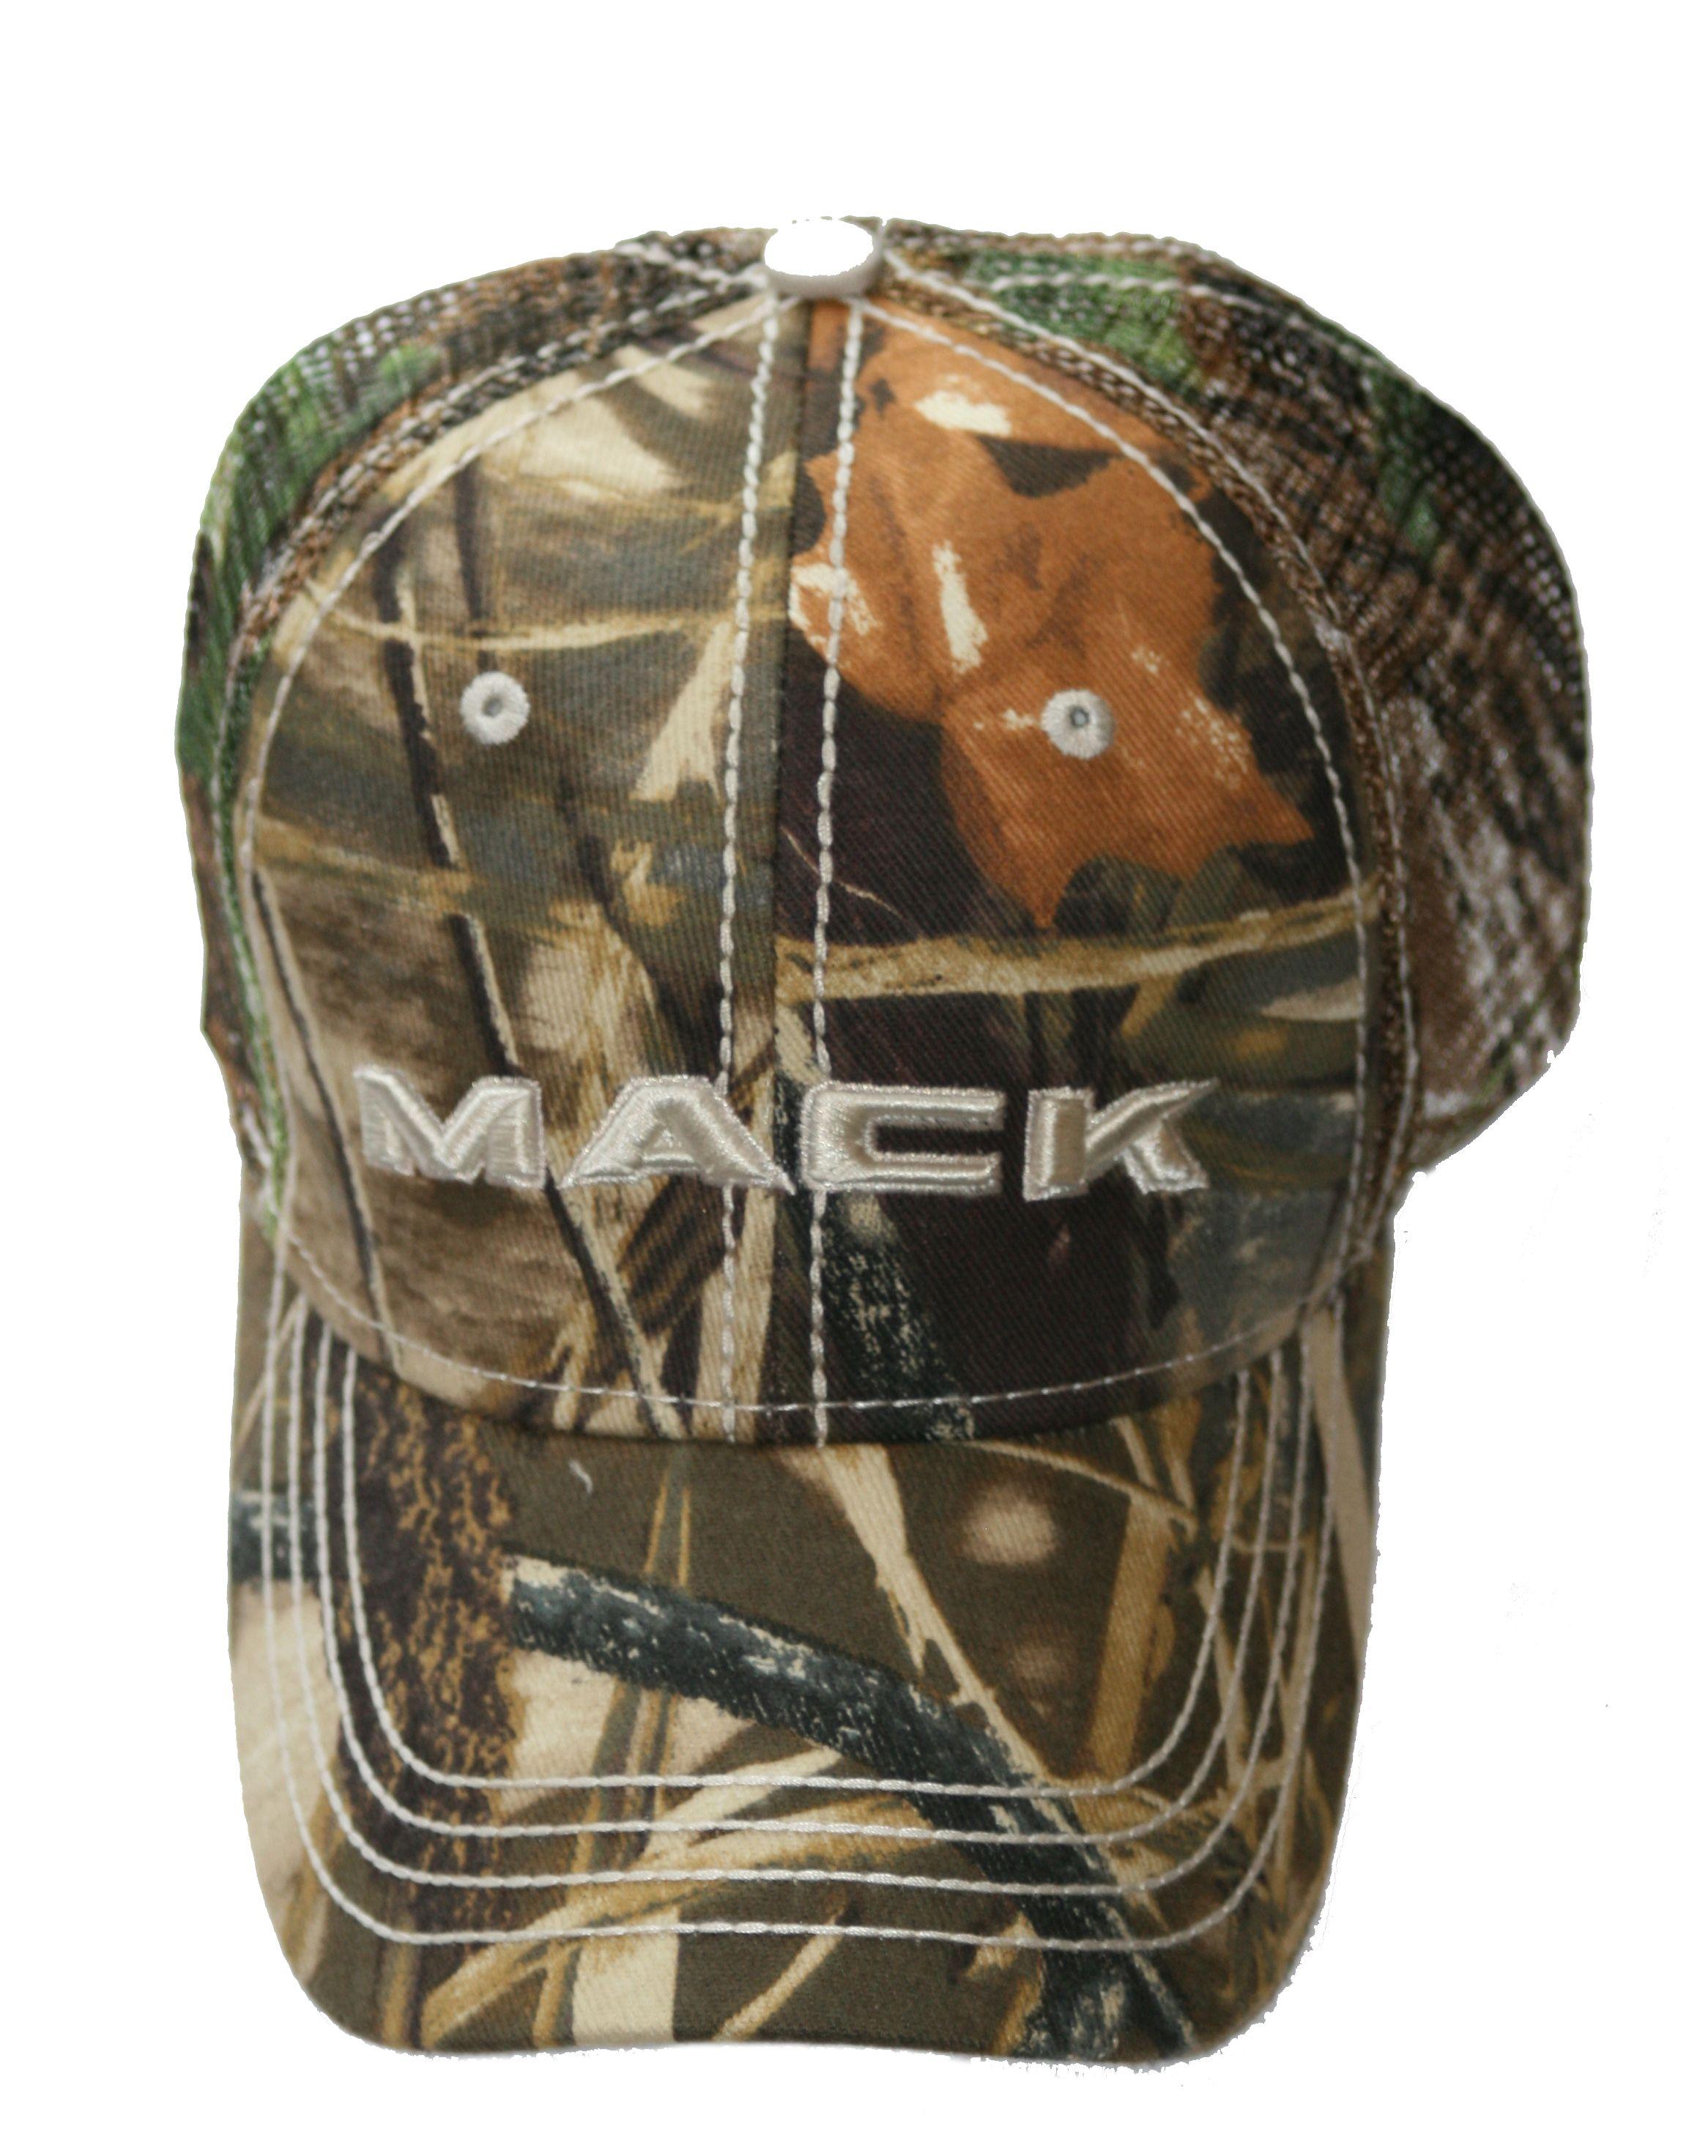 Mack Truck Merchandise - Mack Truck Hats - Mack Trucks Realtree Max-4  Camouflage Snapback Cap - Mack Trucks Realtree Max-4 Camouflage Snapback  Caps dfbaea5ce89